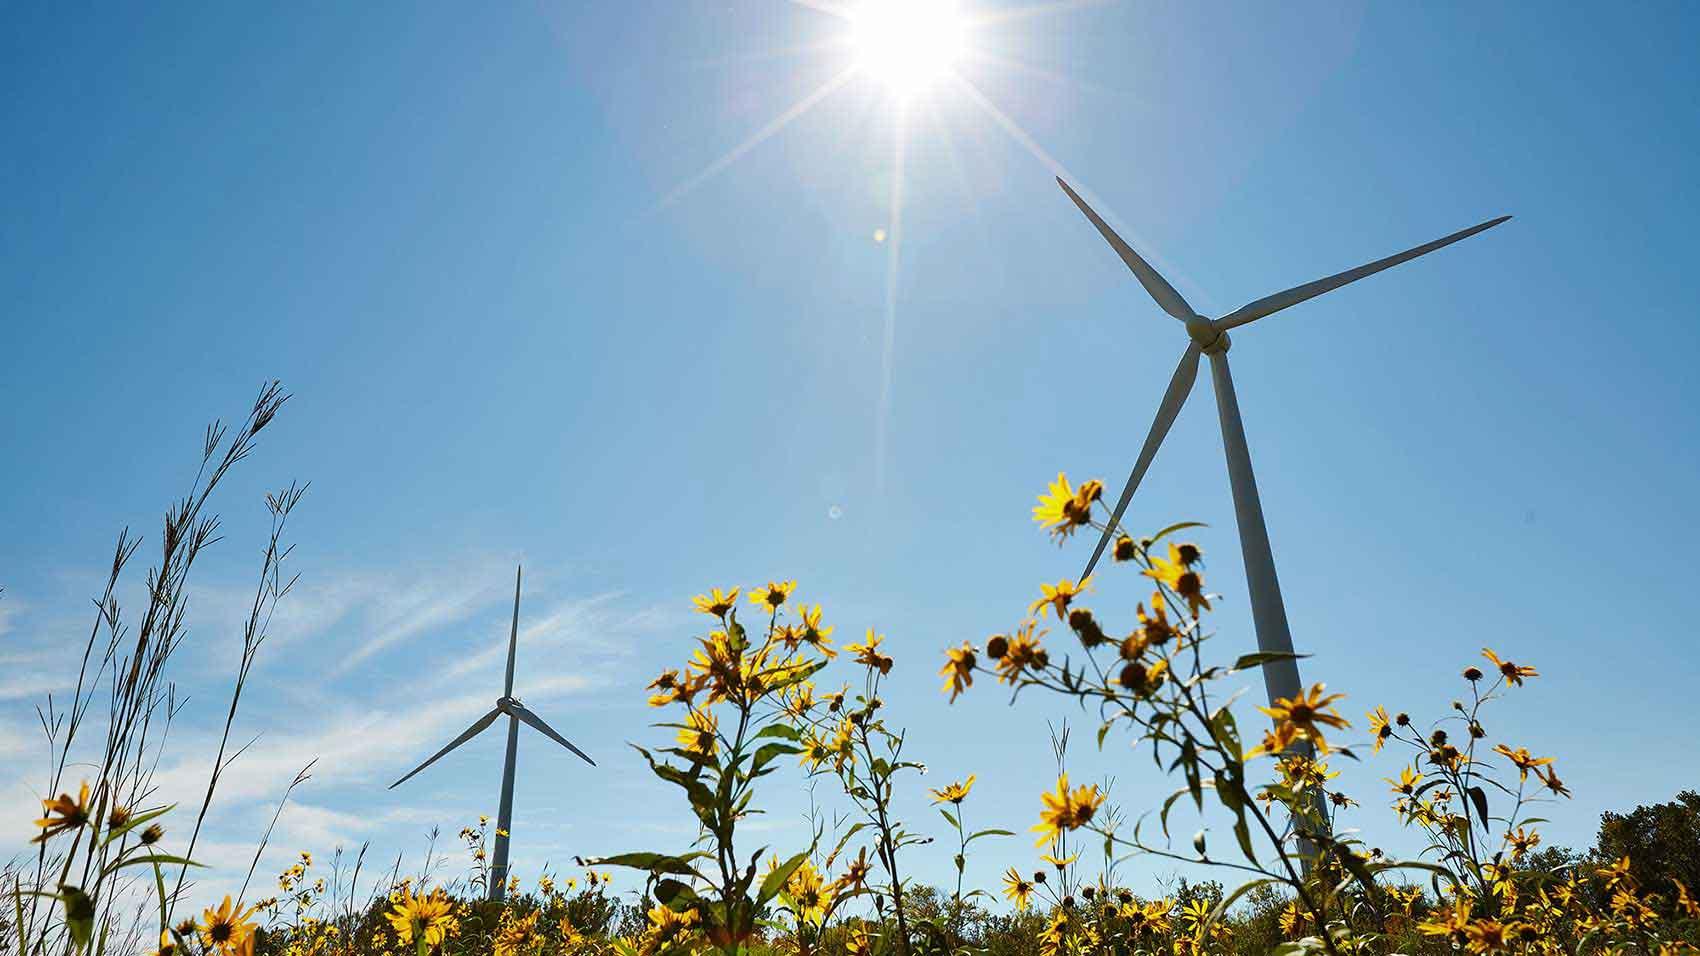 SCジョンソン社は再生可能な風力エネルギーを活用